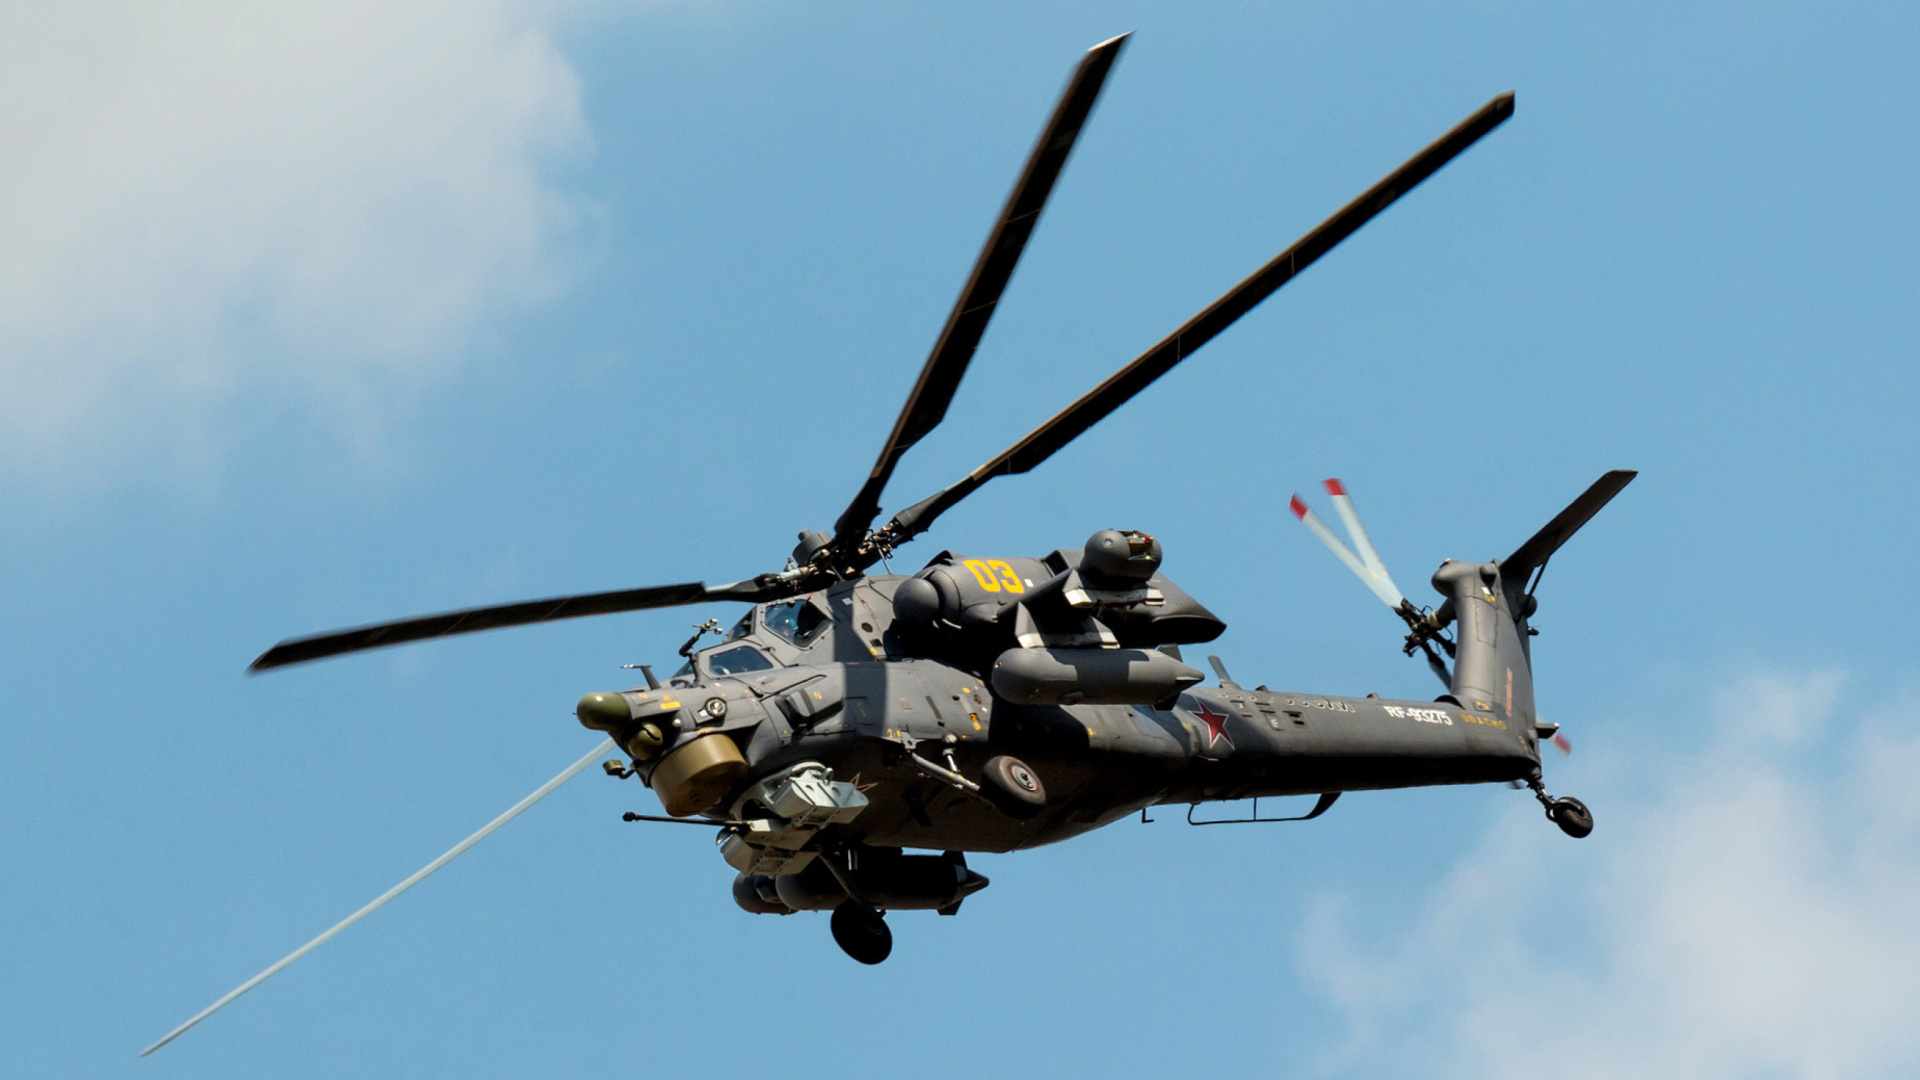 Elicottero Havoc : Mil mi havoc helicopter sfondi gratuiti per desktop